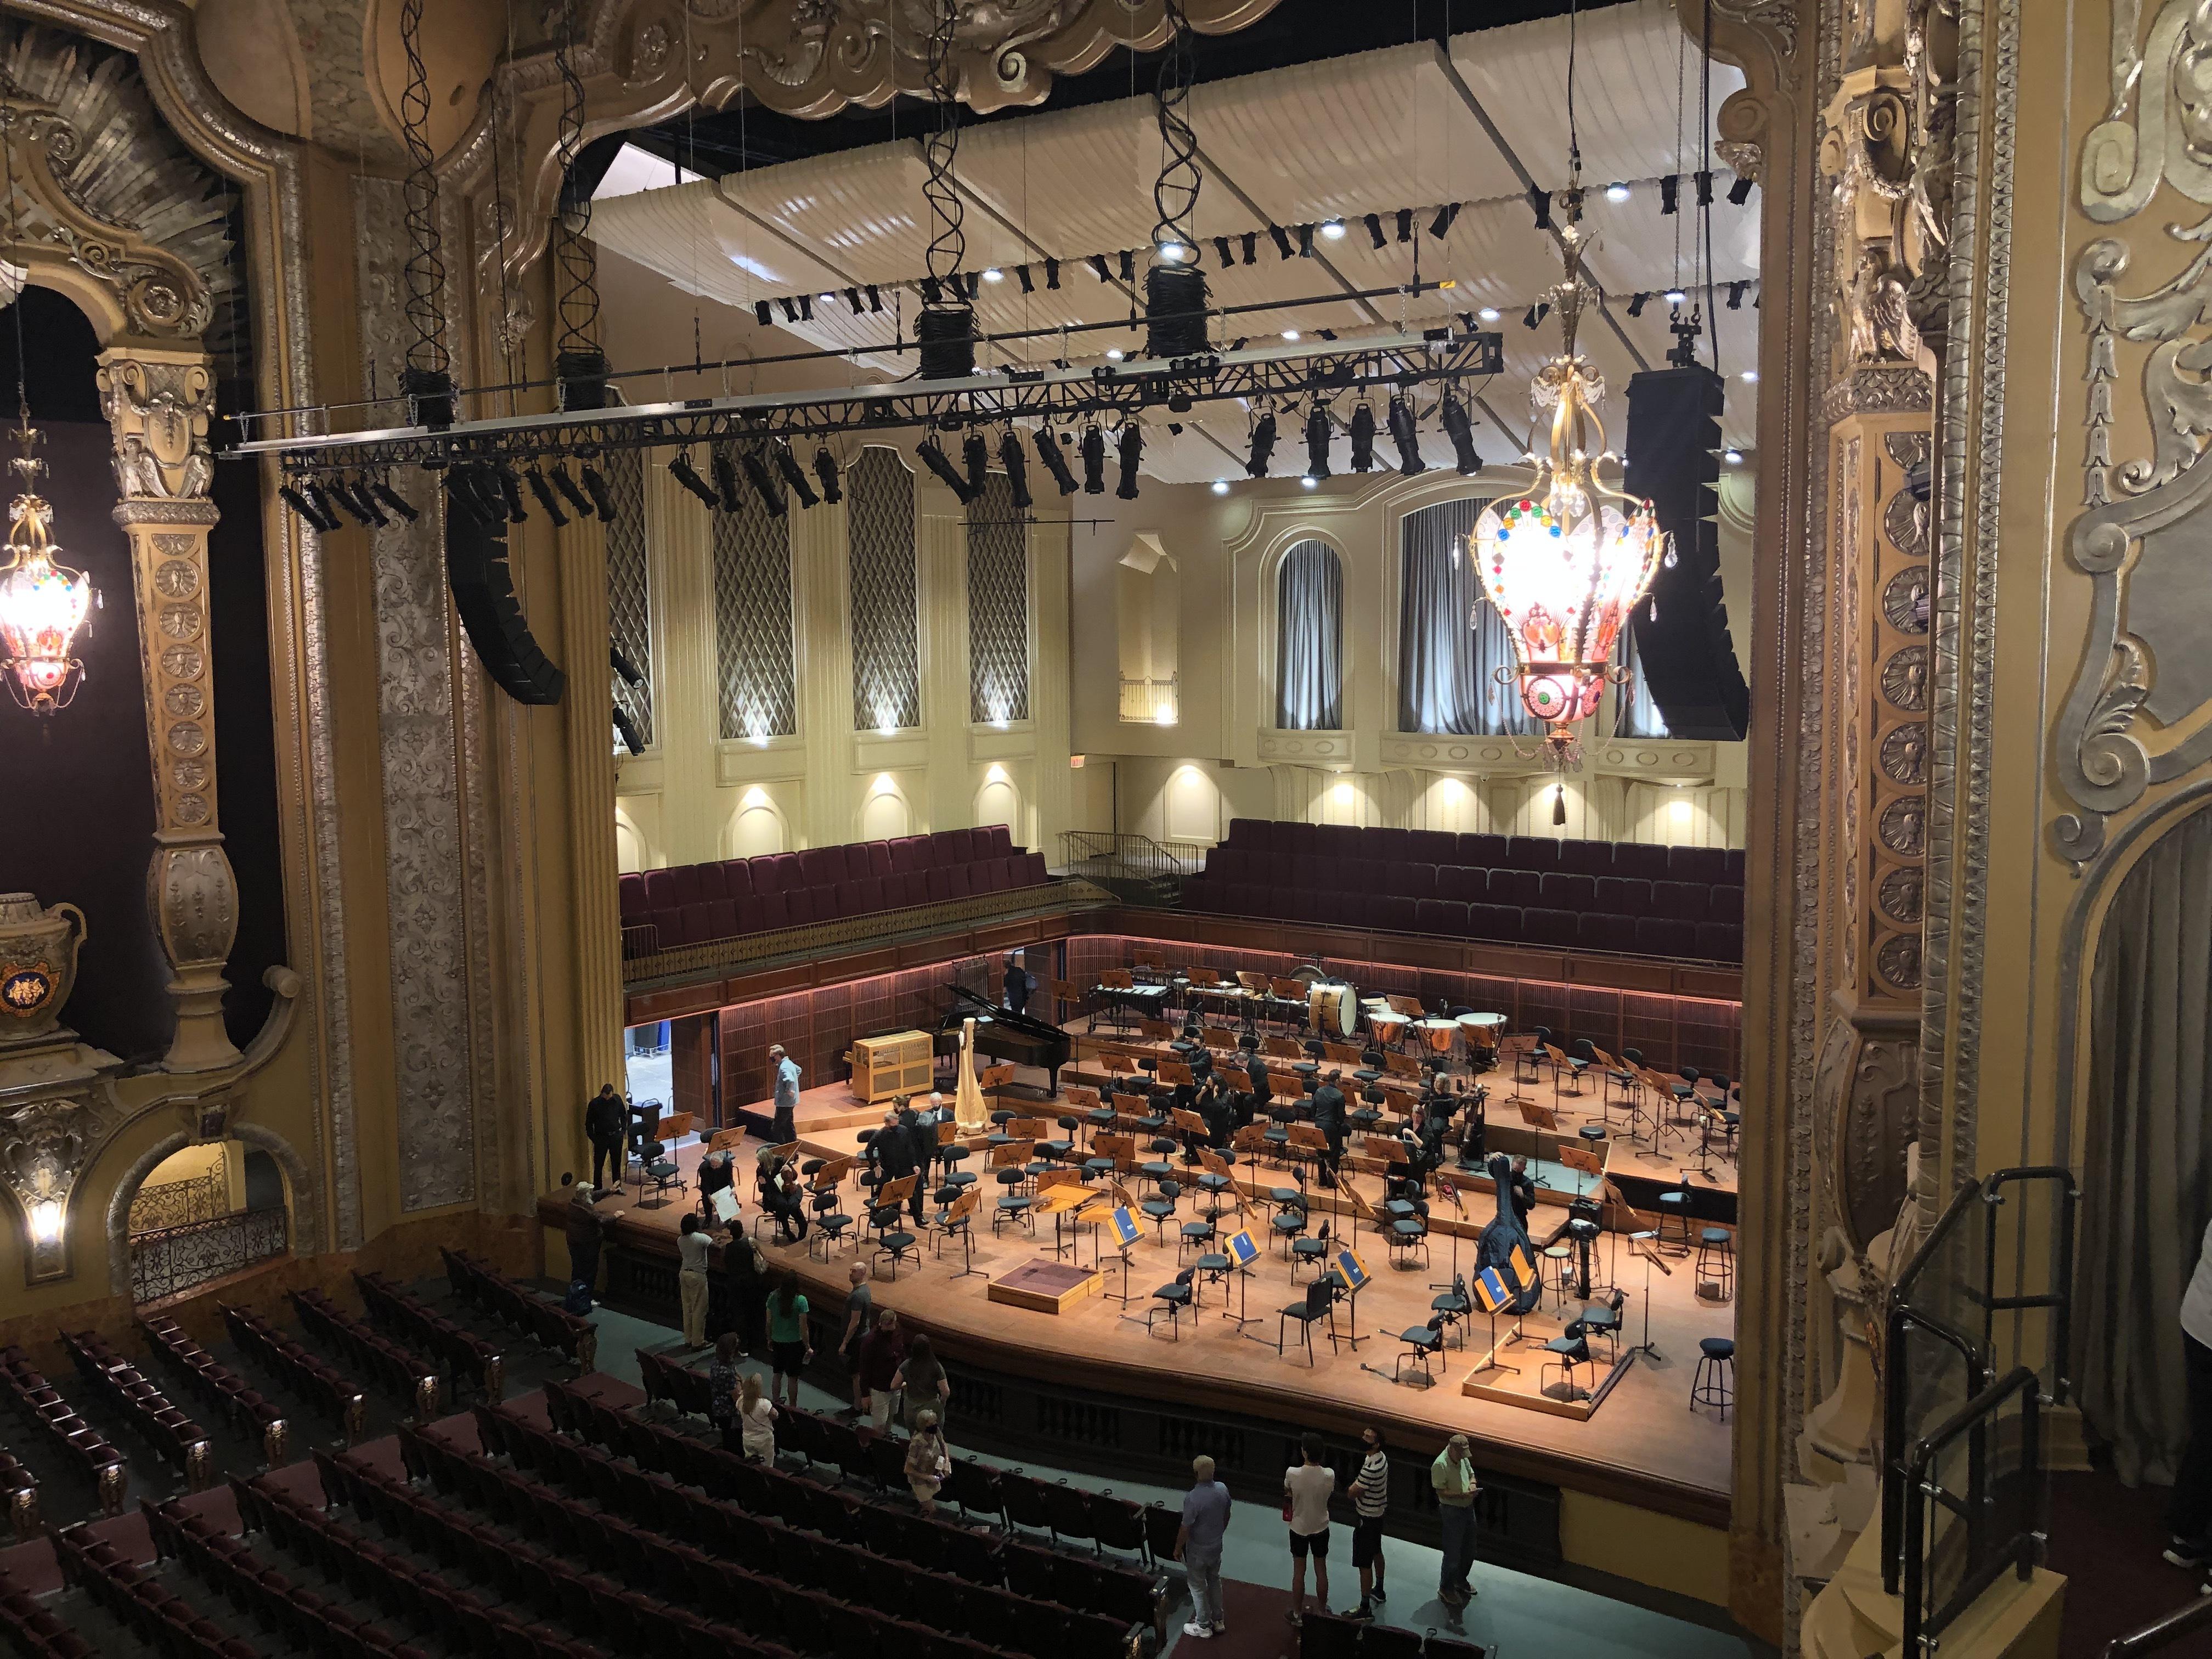 Bradley Symphony Center. Photo taken September 26, 2021 by Dave Reid.